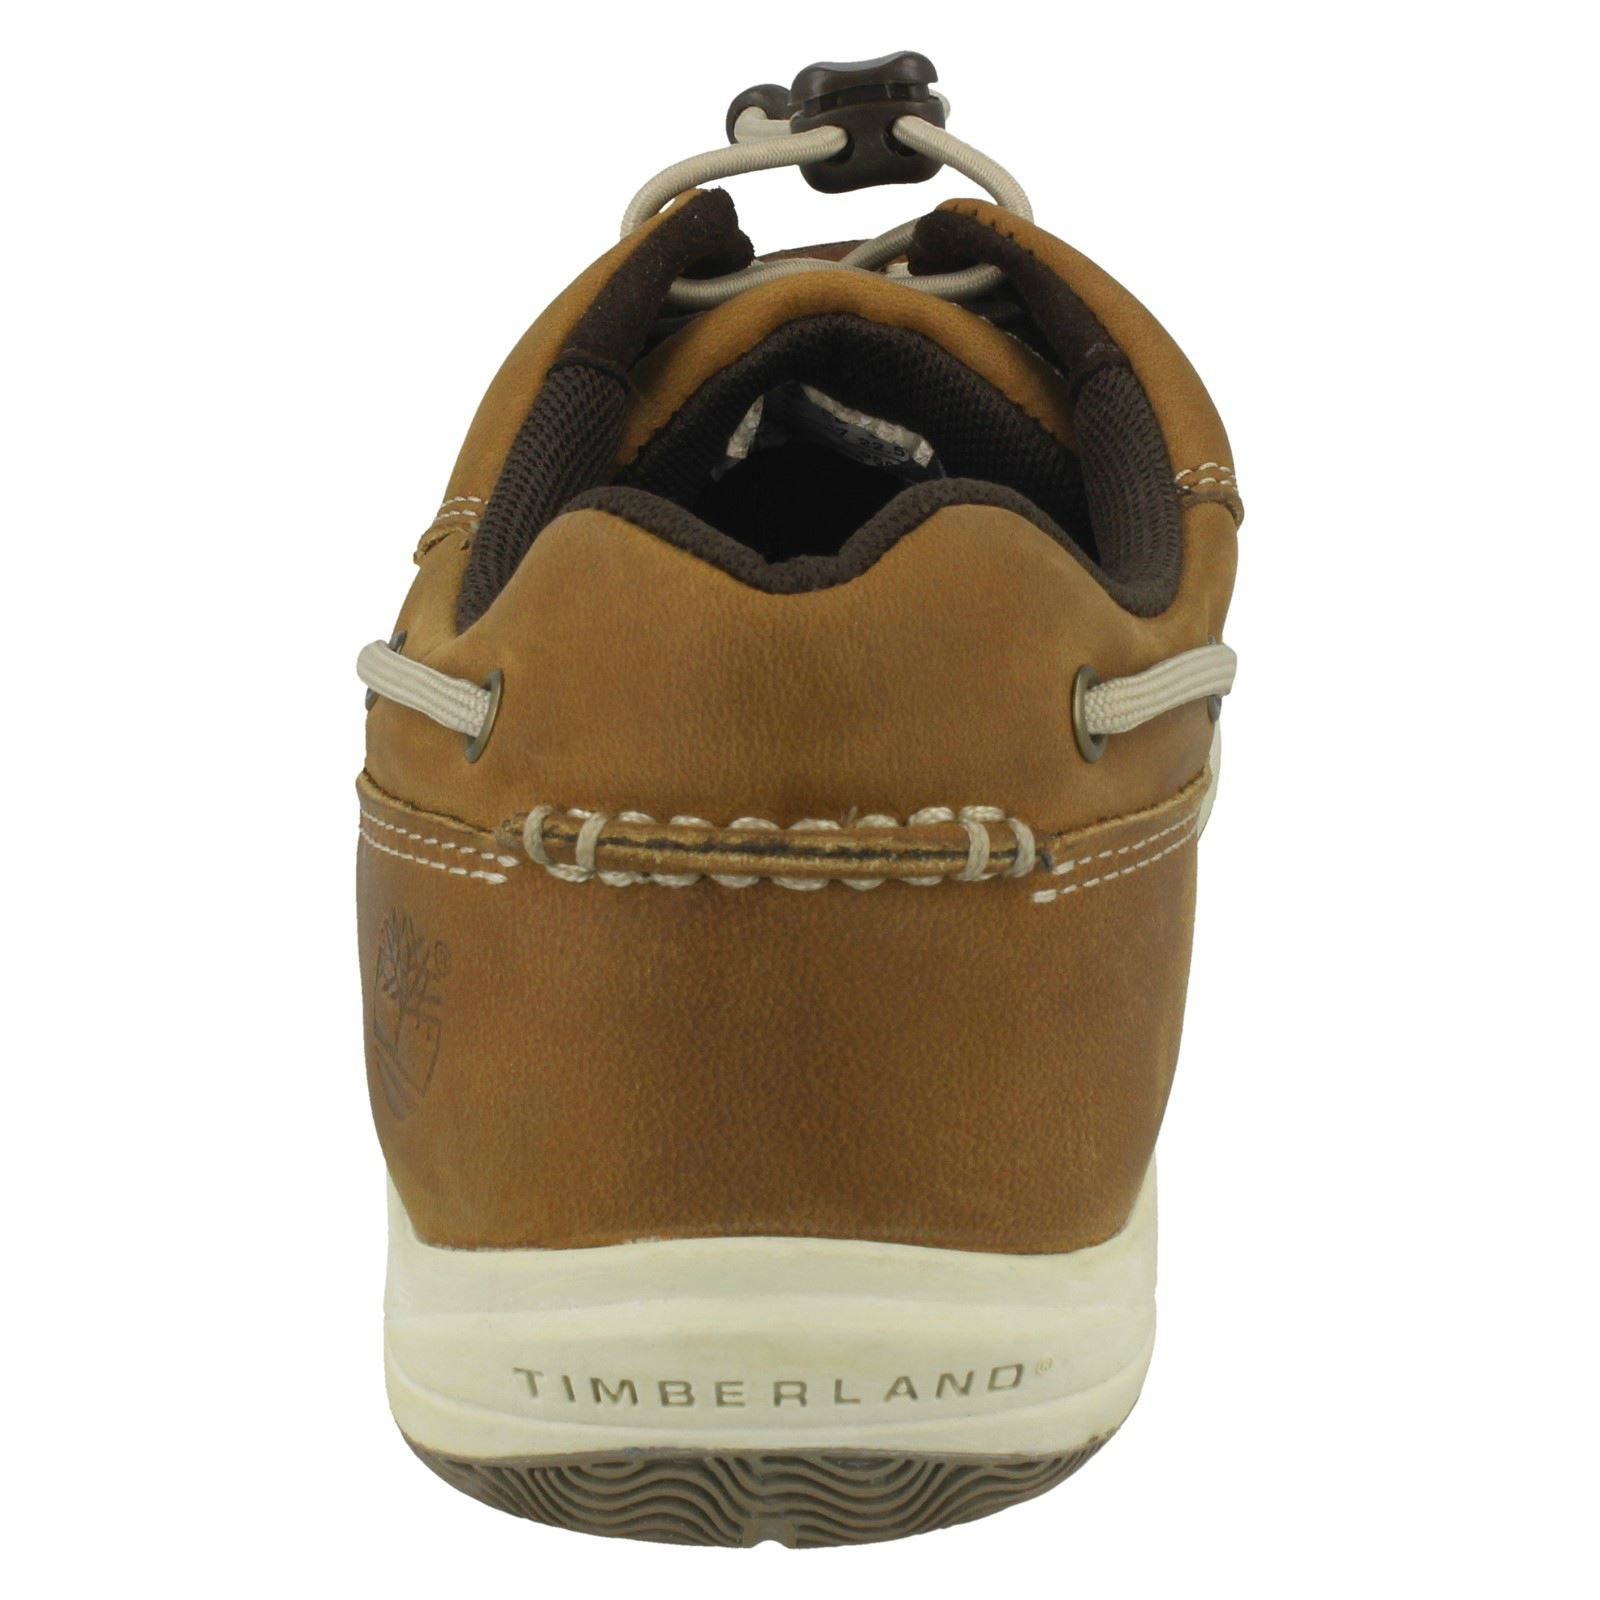 Chicos-Informal-Zapatos-Timberland-80939